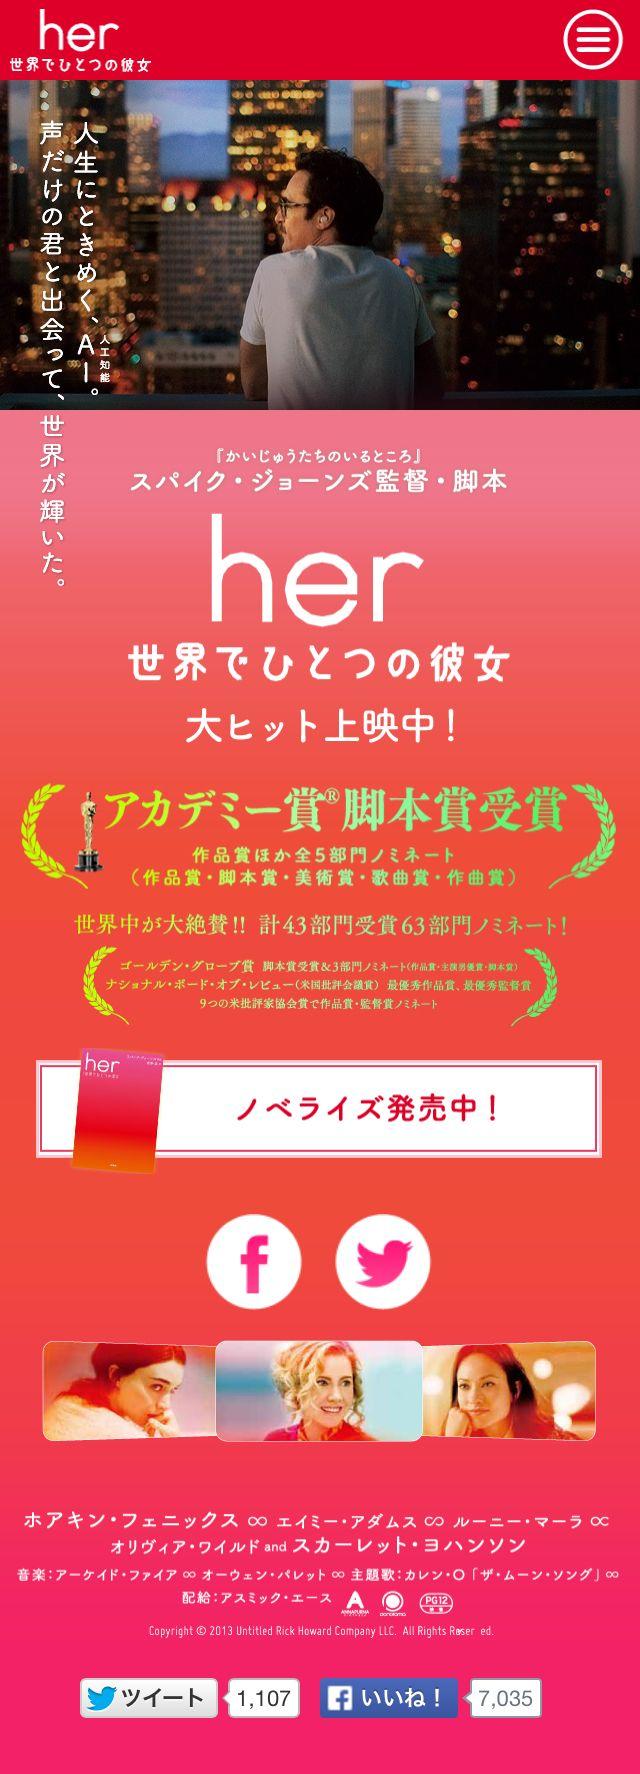 http://her.asmik-ace.co.jp/sp/